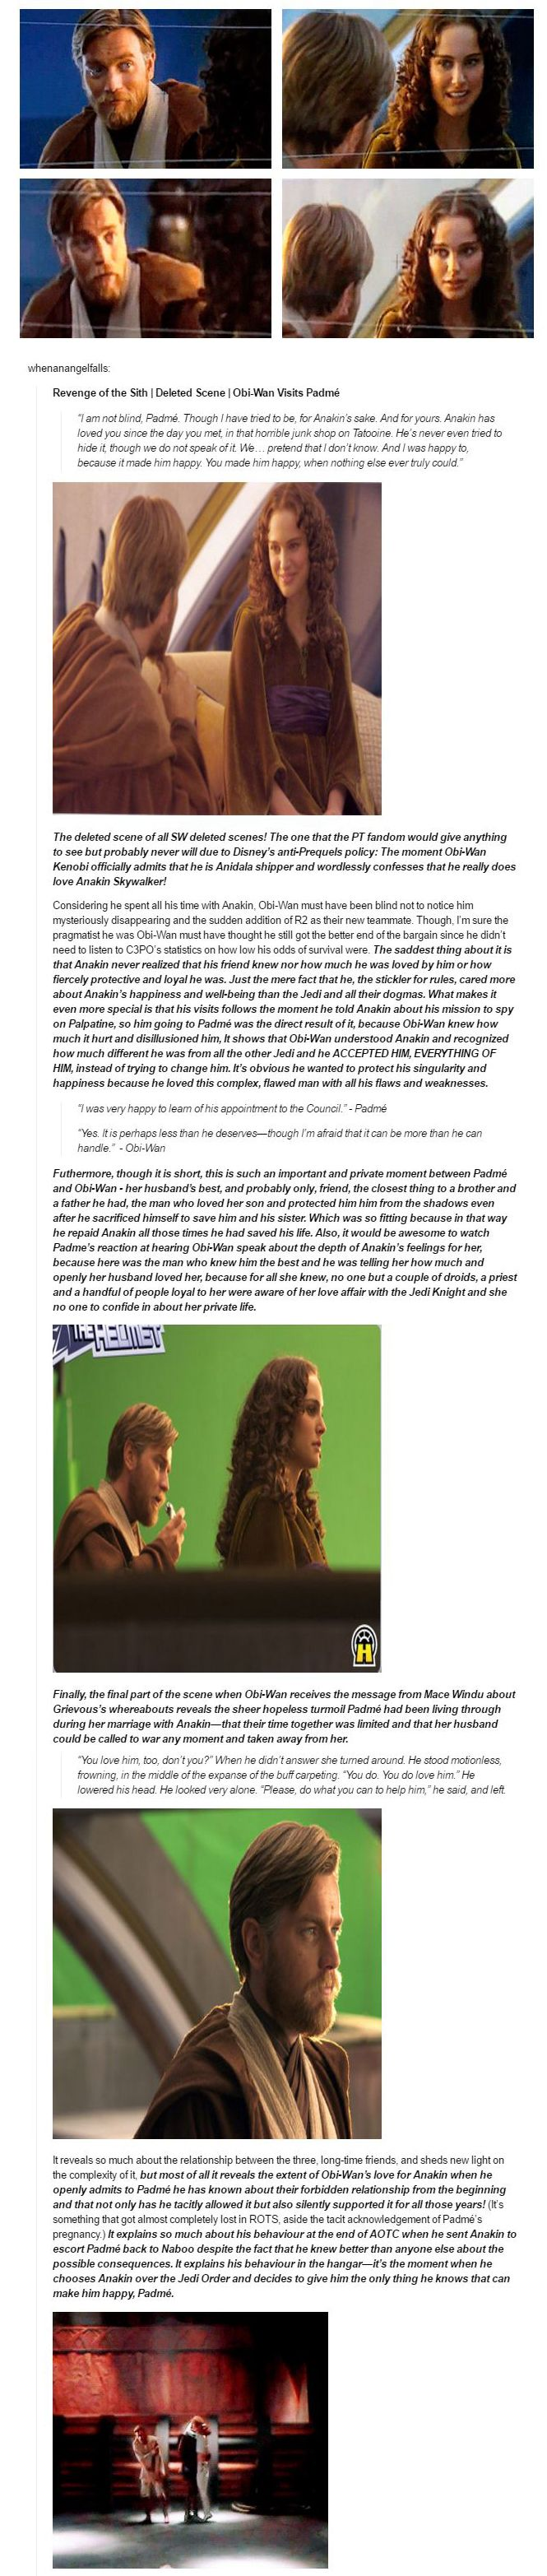 Obi-Wan Kenobi, Padme, and how he feels about the Skywalker marriage